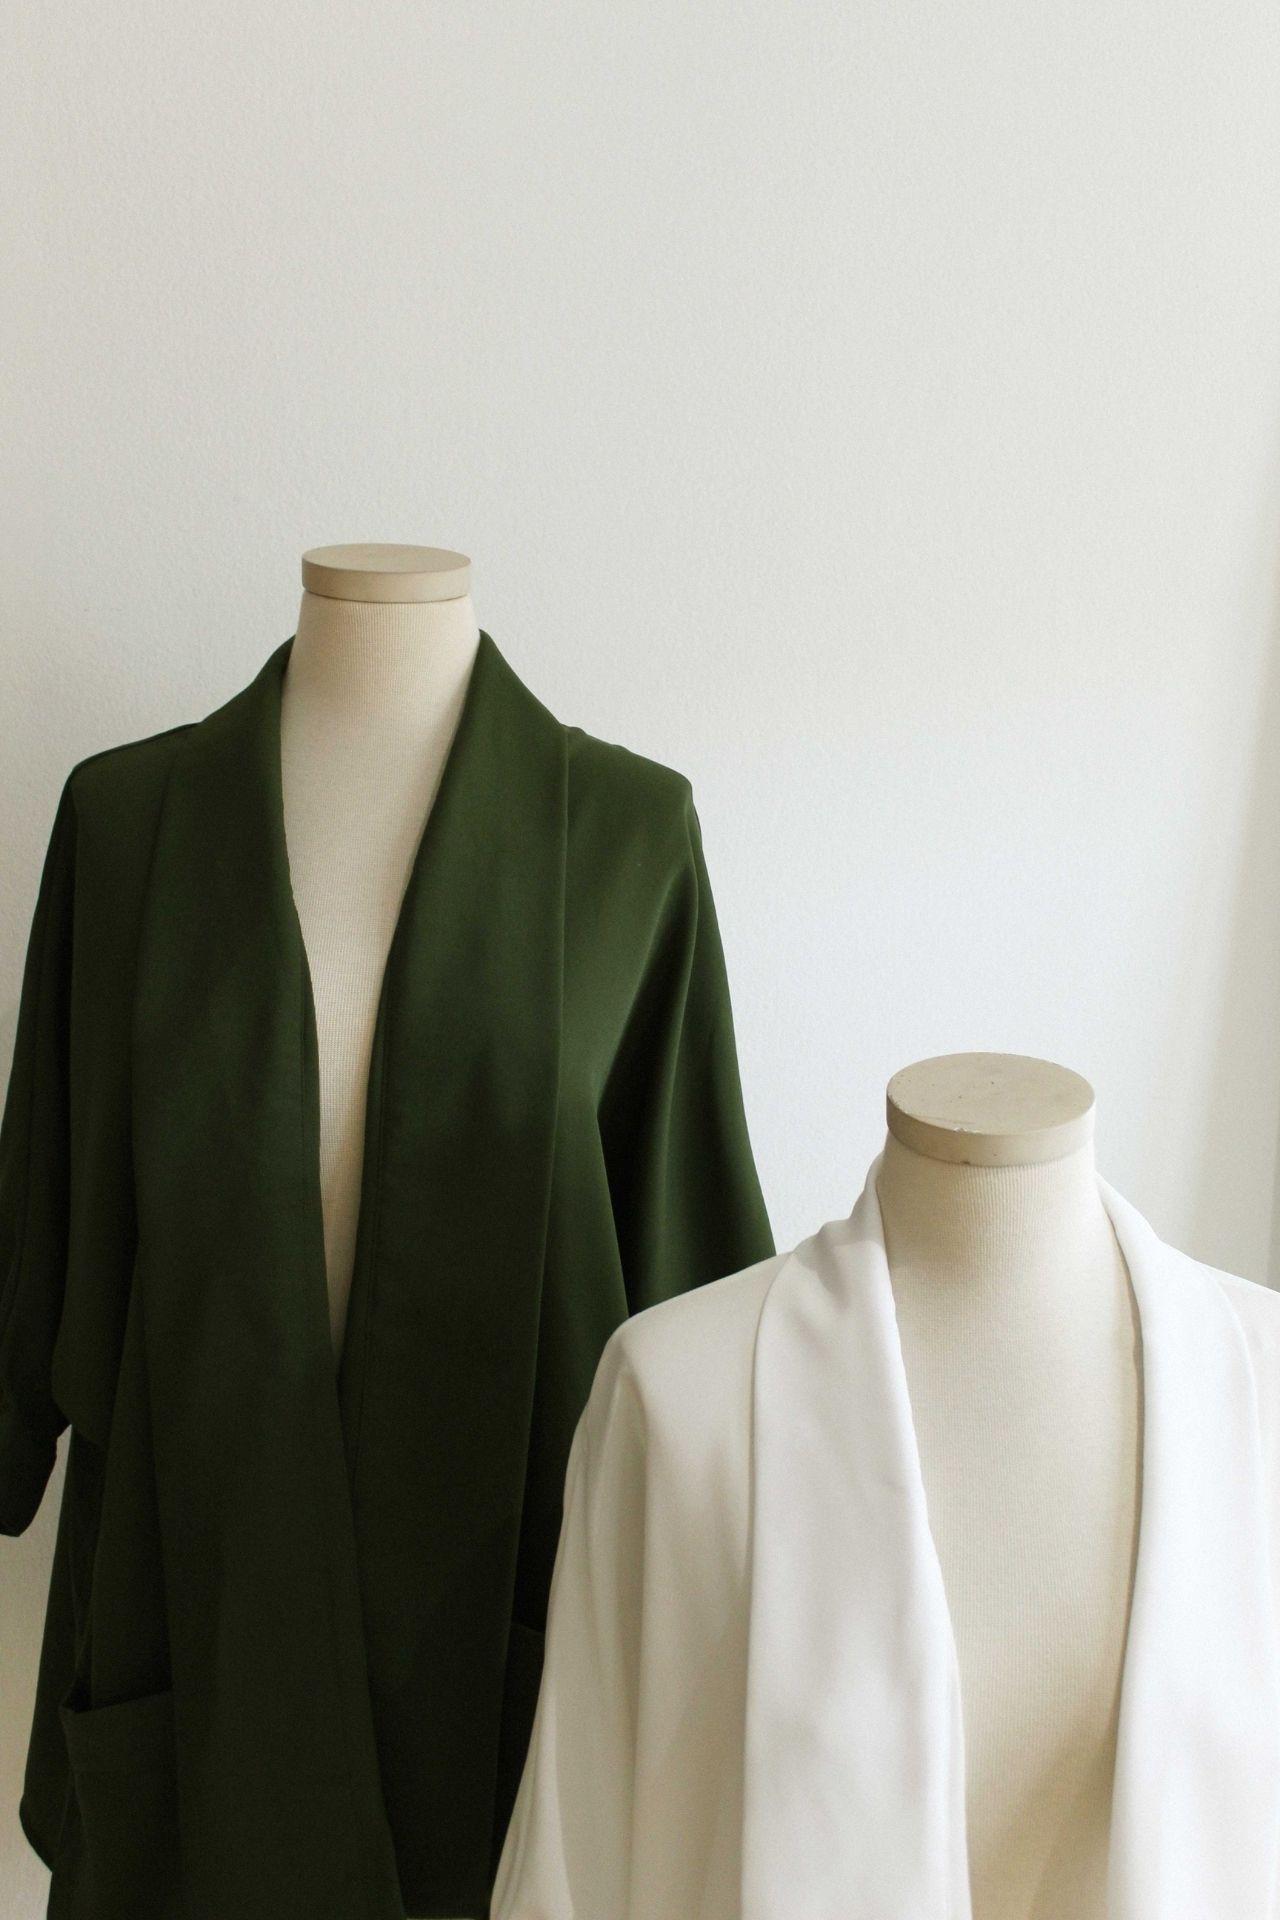 Kimono estilo camisero de silueta relajada Detalles: • Cuello esmoquin. • Botones en puño. • Bolsillos estilo parche. • 100% algodón